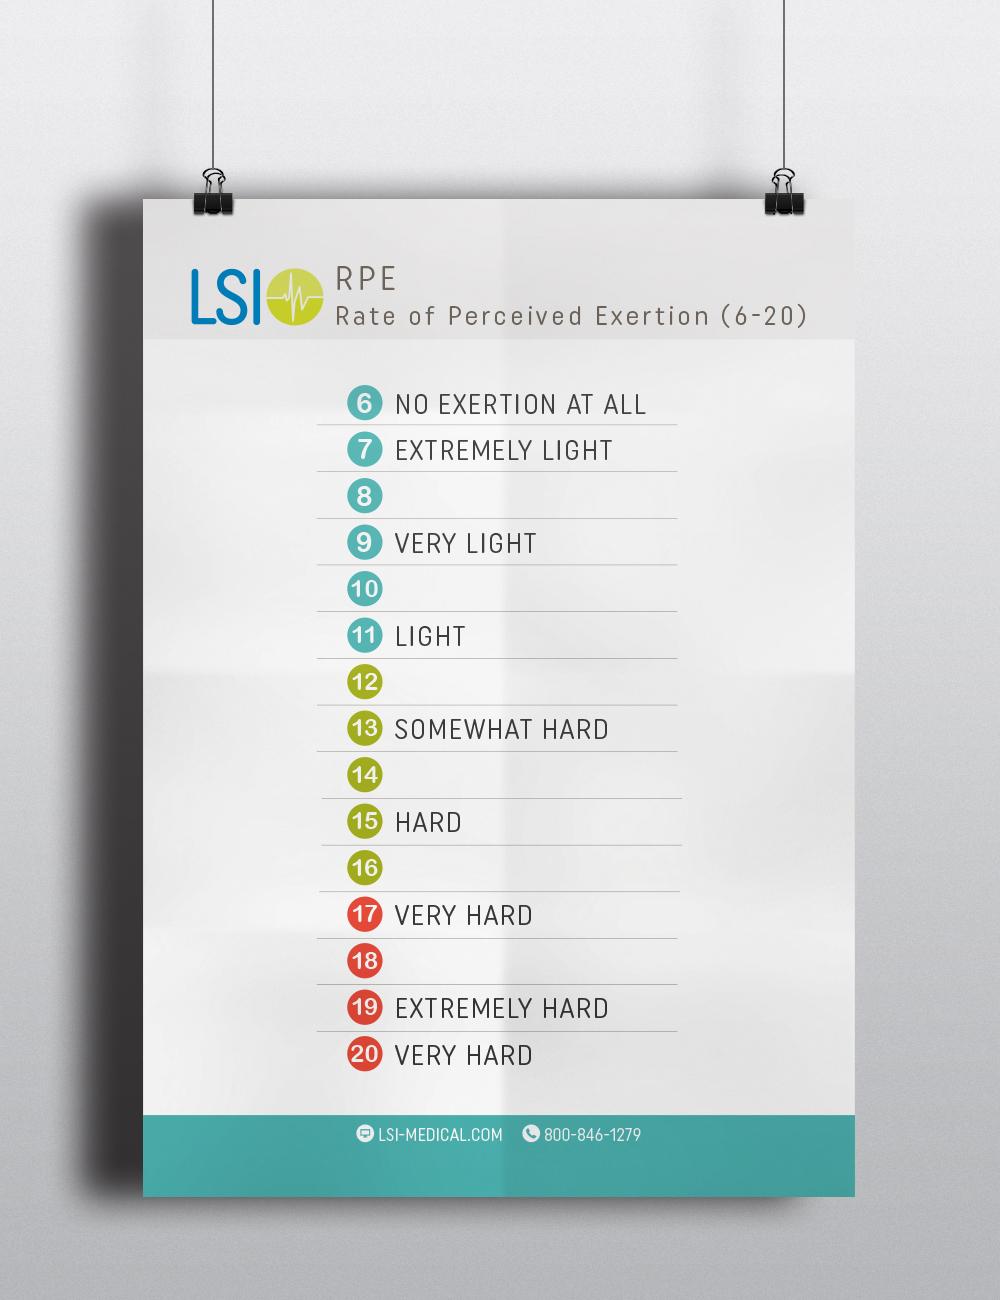 LSI Borg Scale